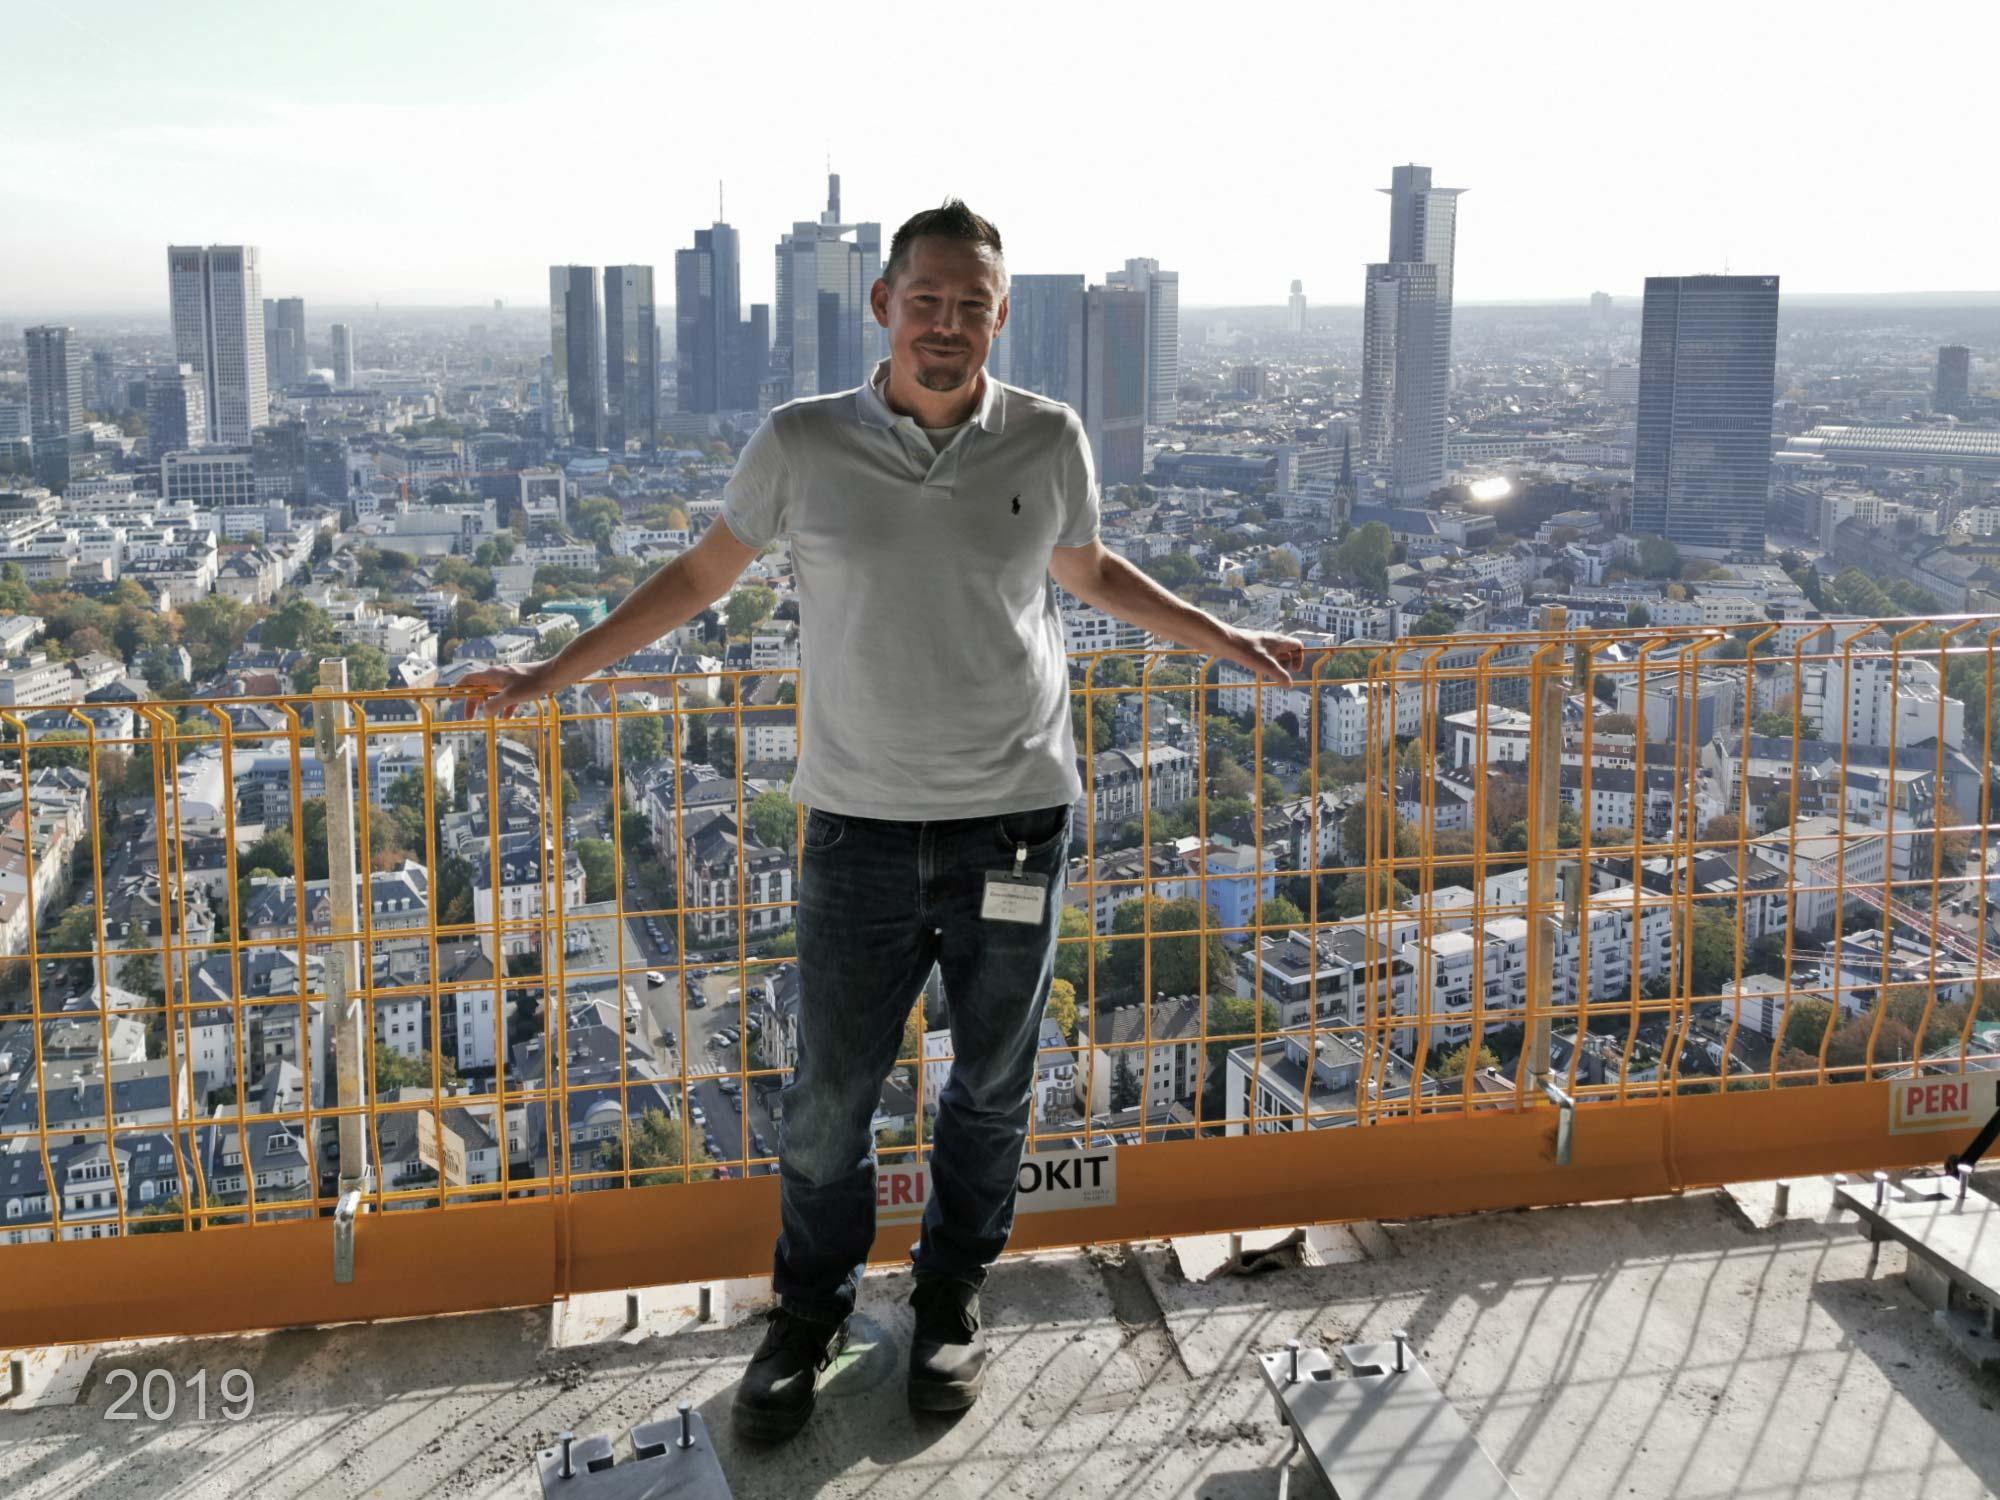 Tall building expert Michael Wutzke in front of Frankfurt's CBD skyline